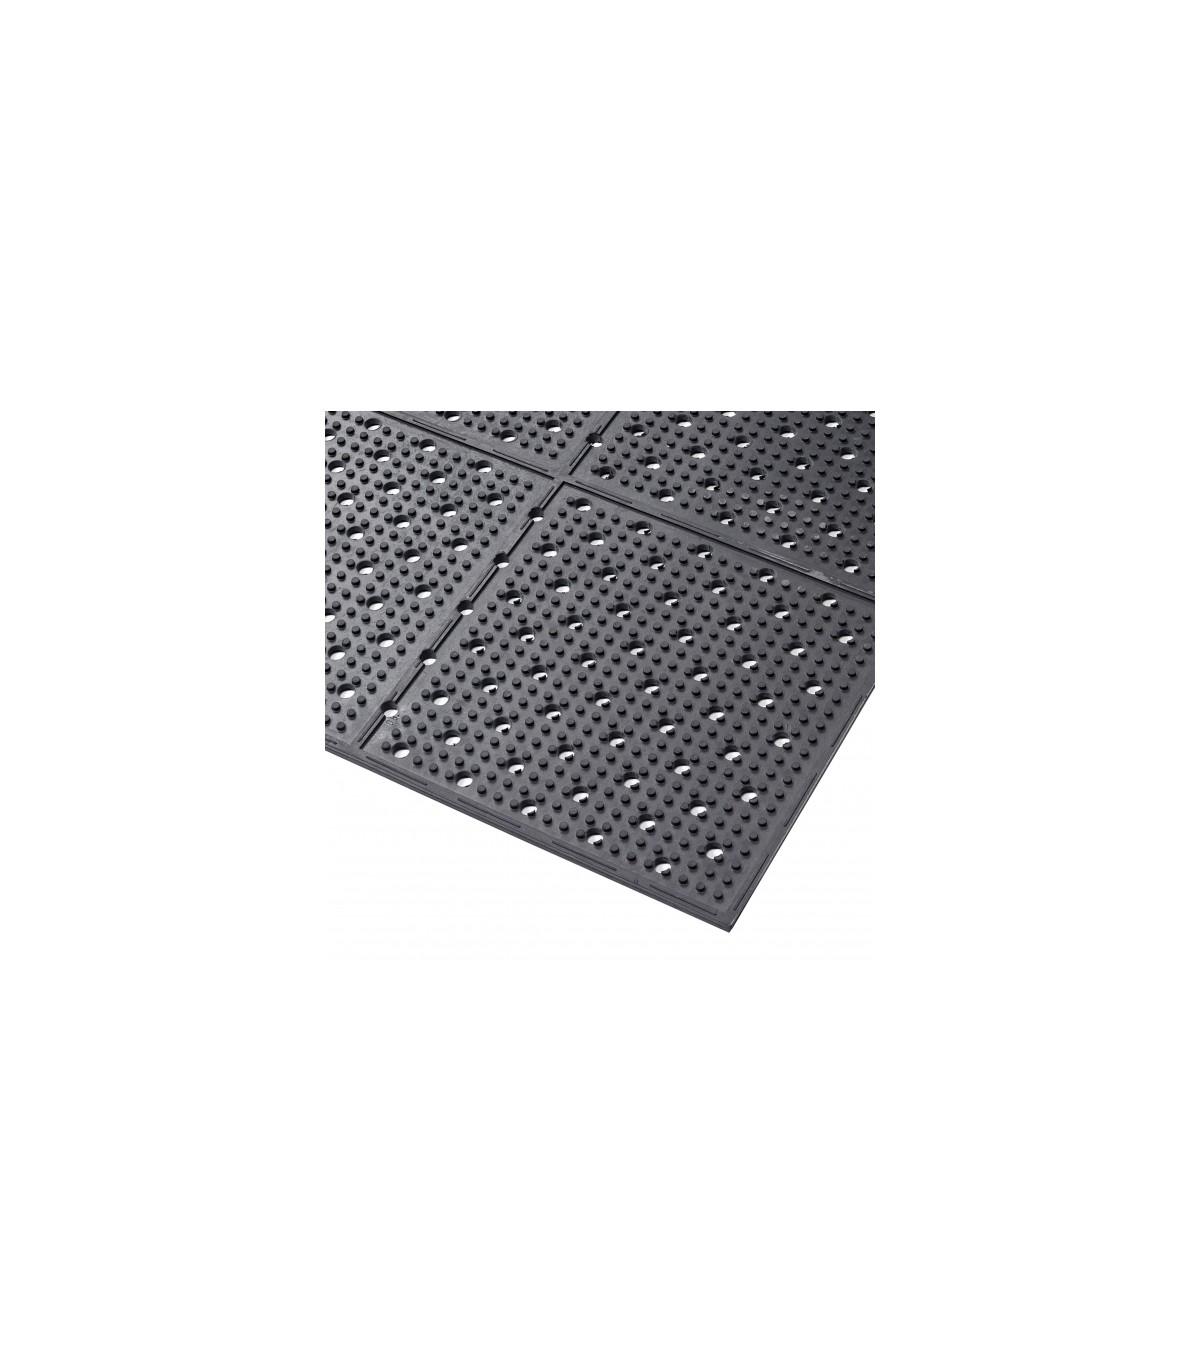 tapis anti derapant perfore reversible en caoutchouc